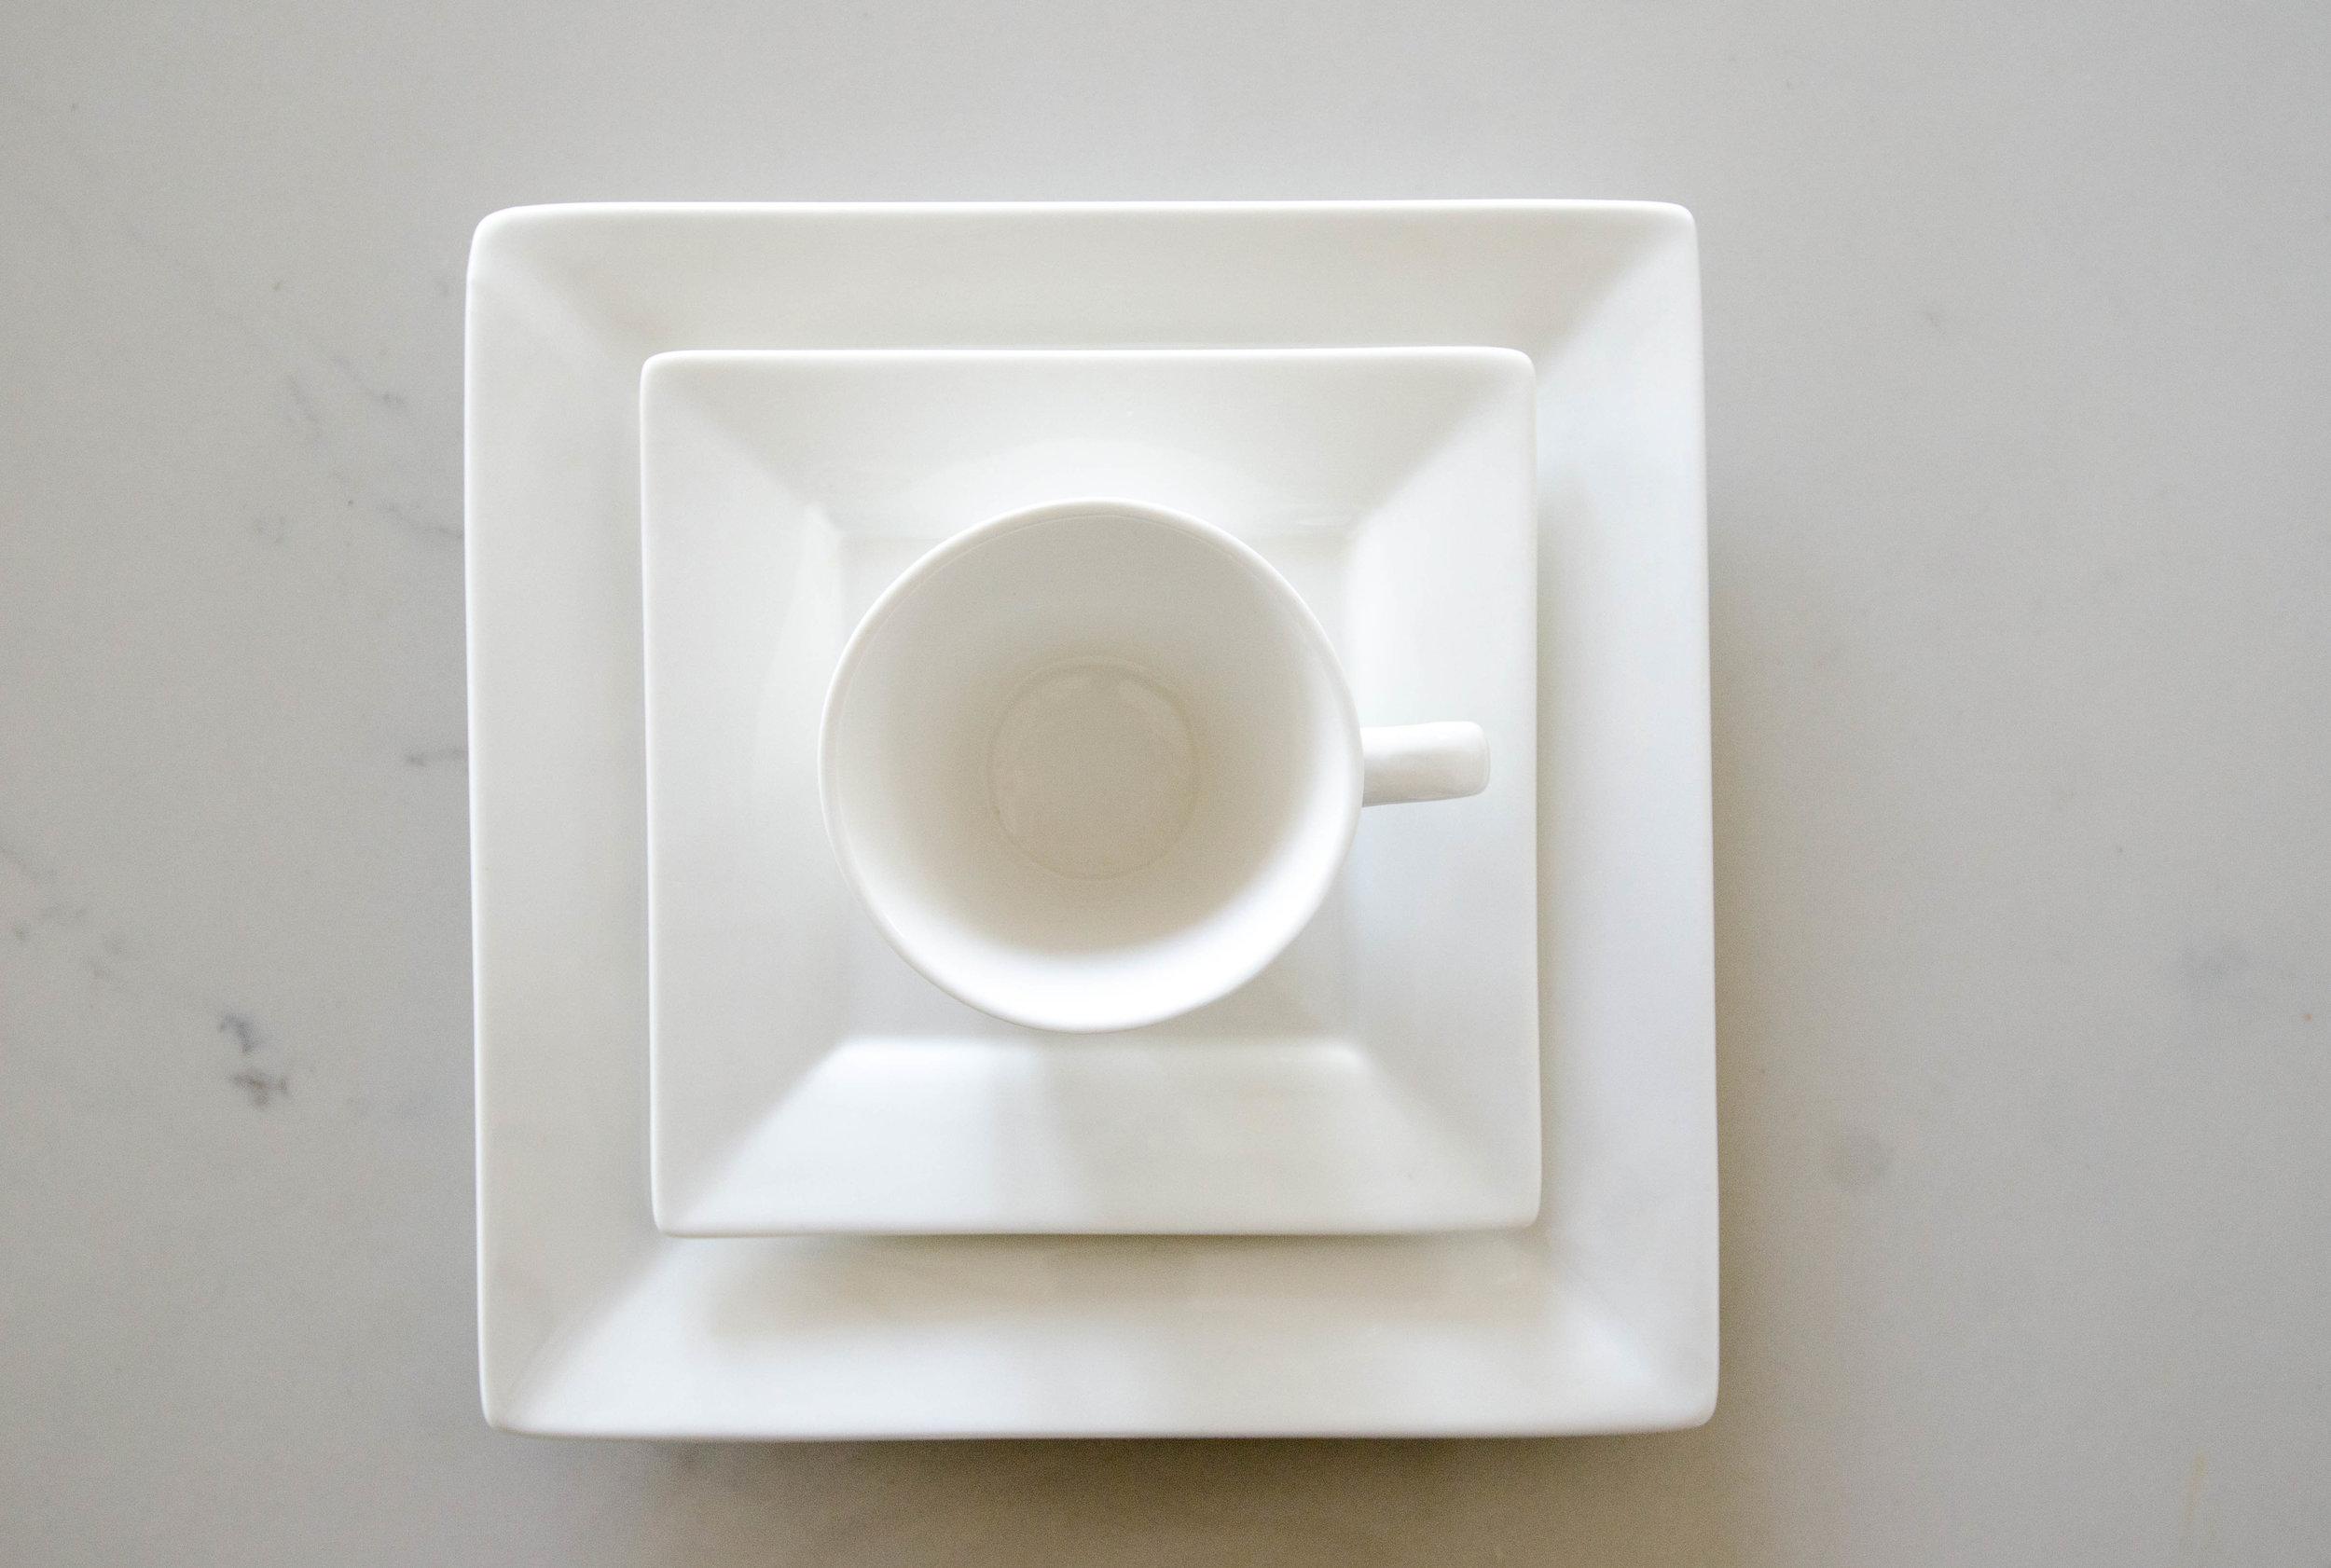 White Square Dinnerware